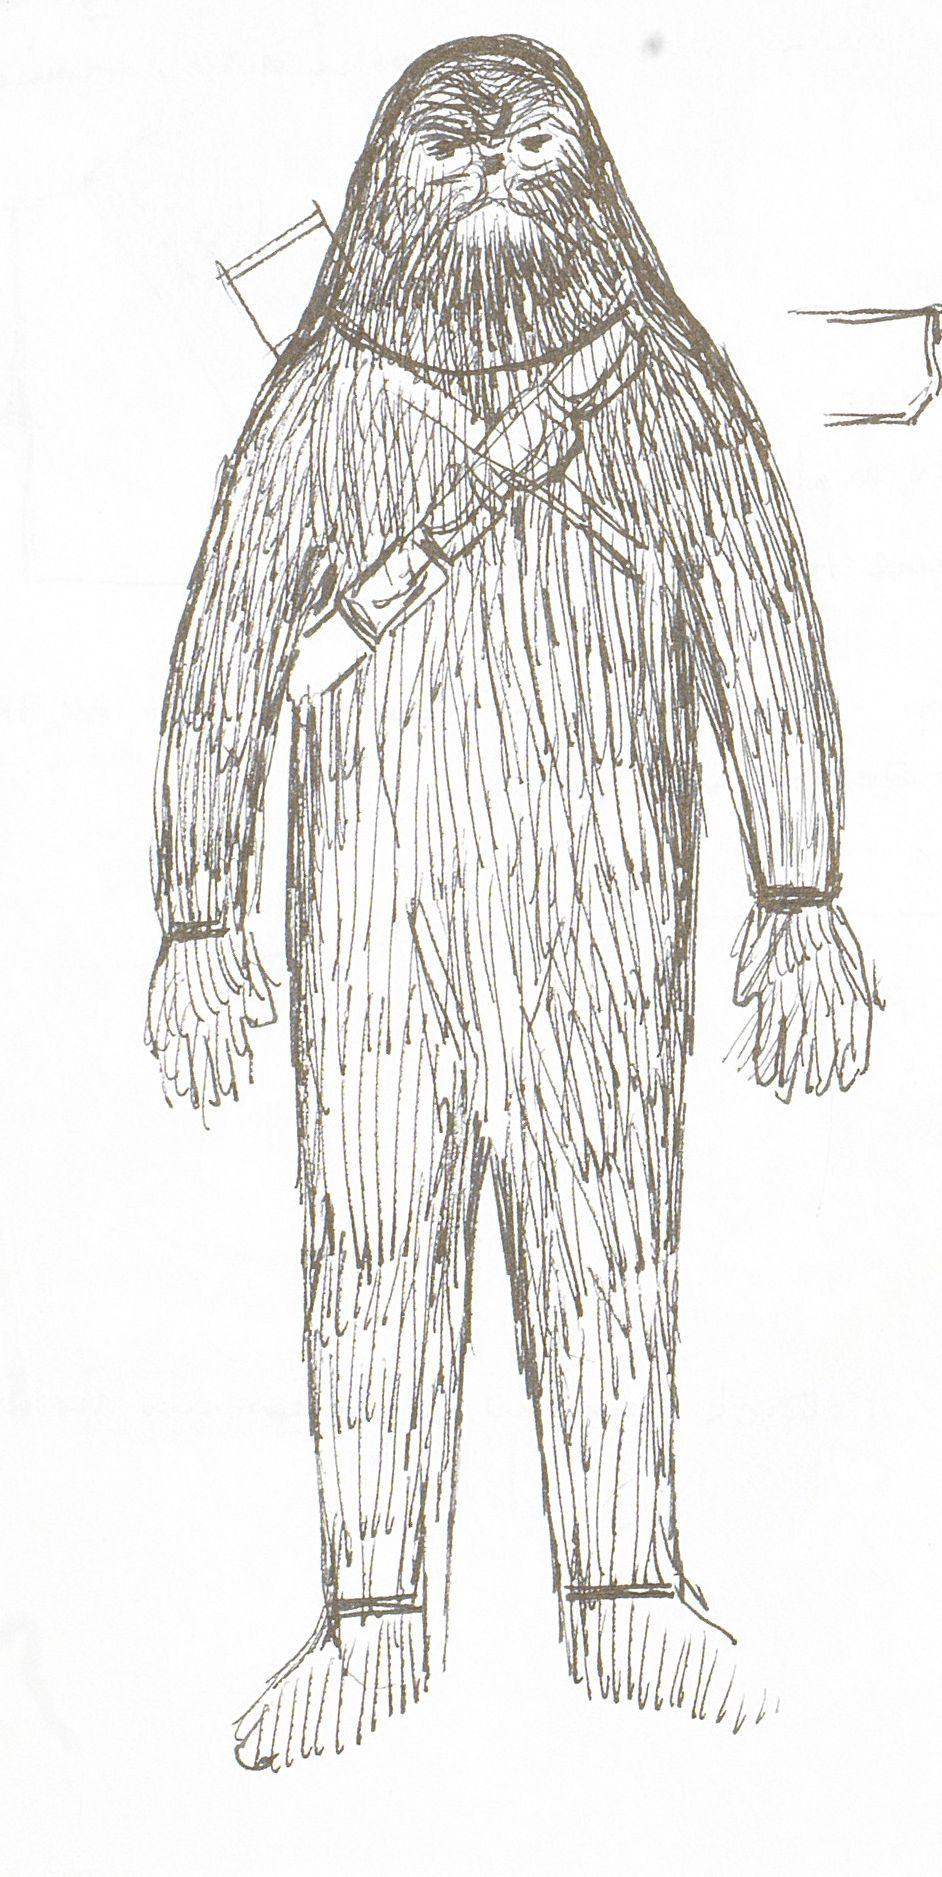 Sketch of Chewbacca